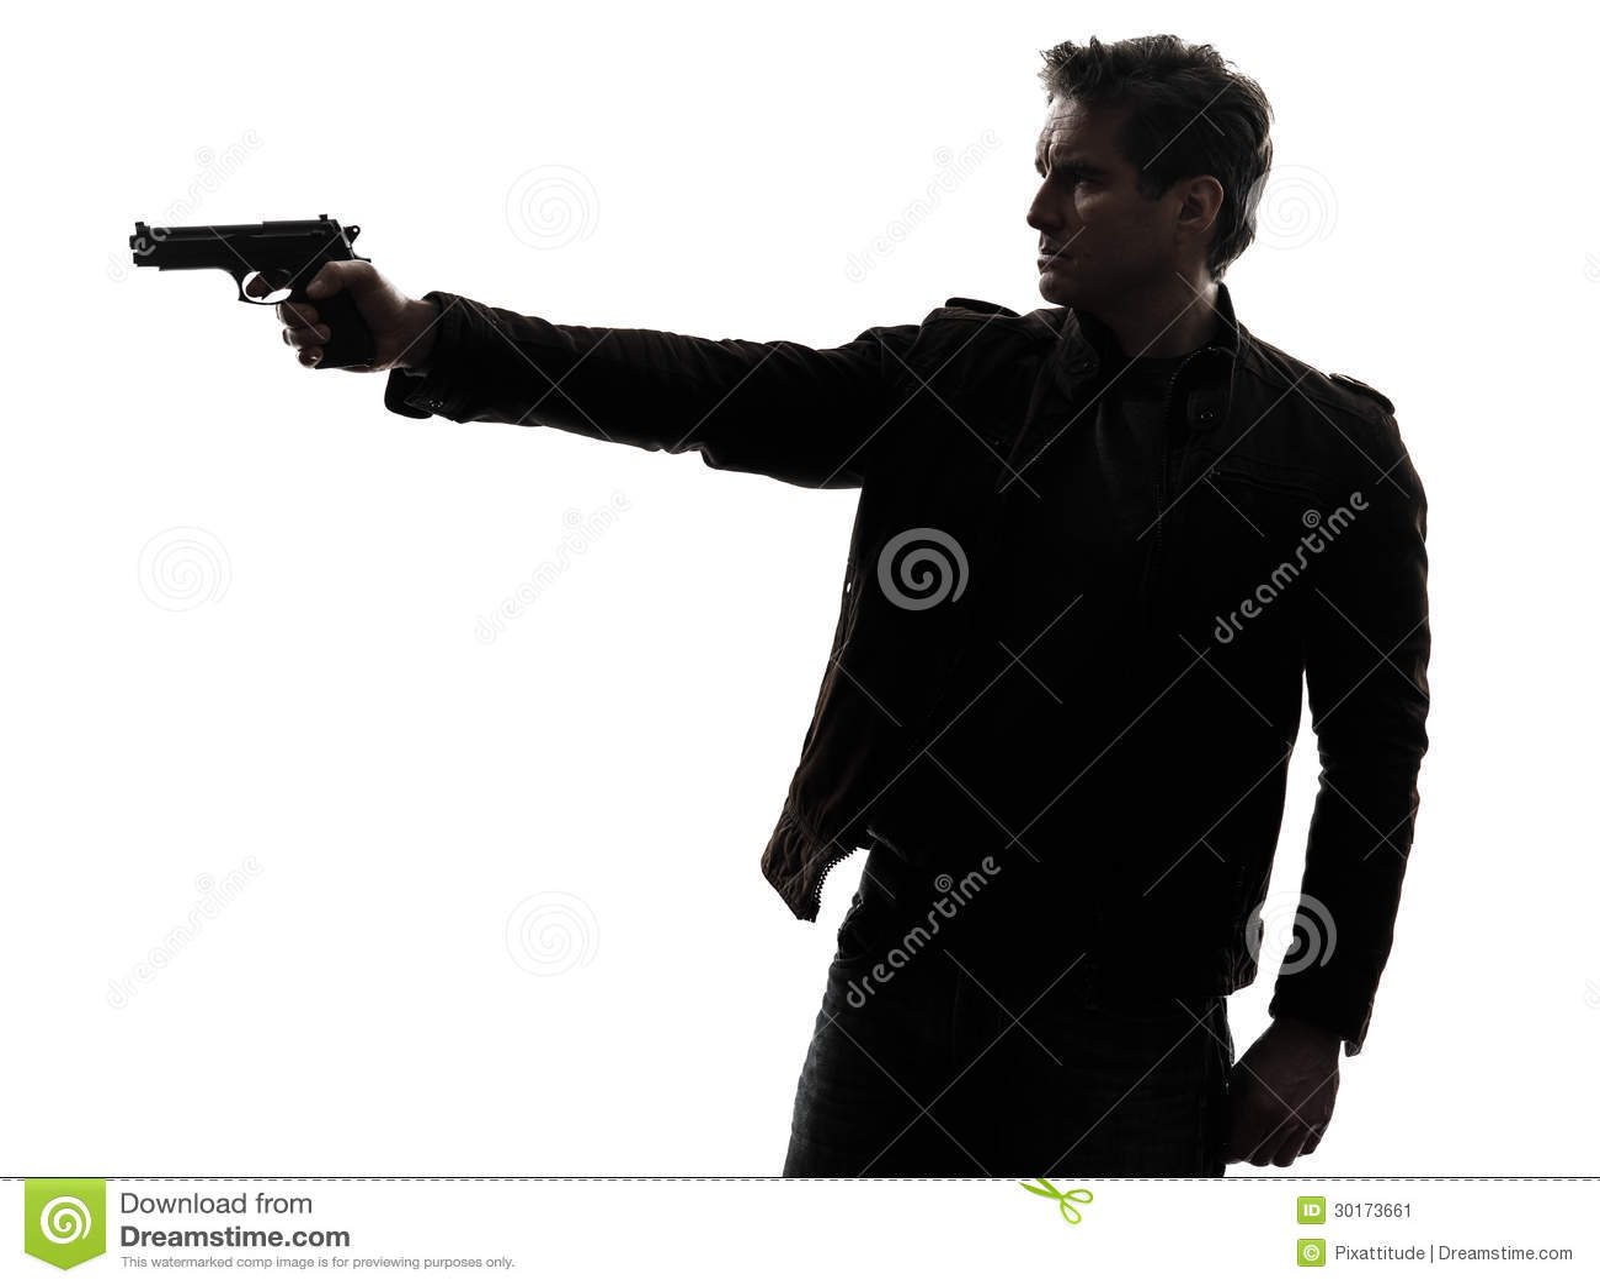 Man Killer Policeman Aiming Gun Silhouette Stock Image ...